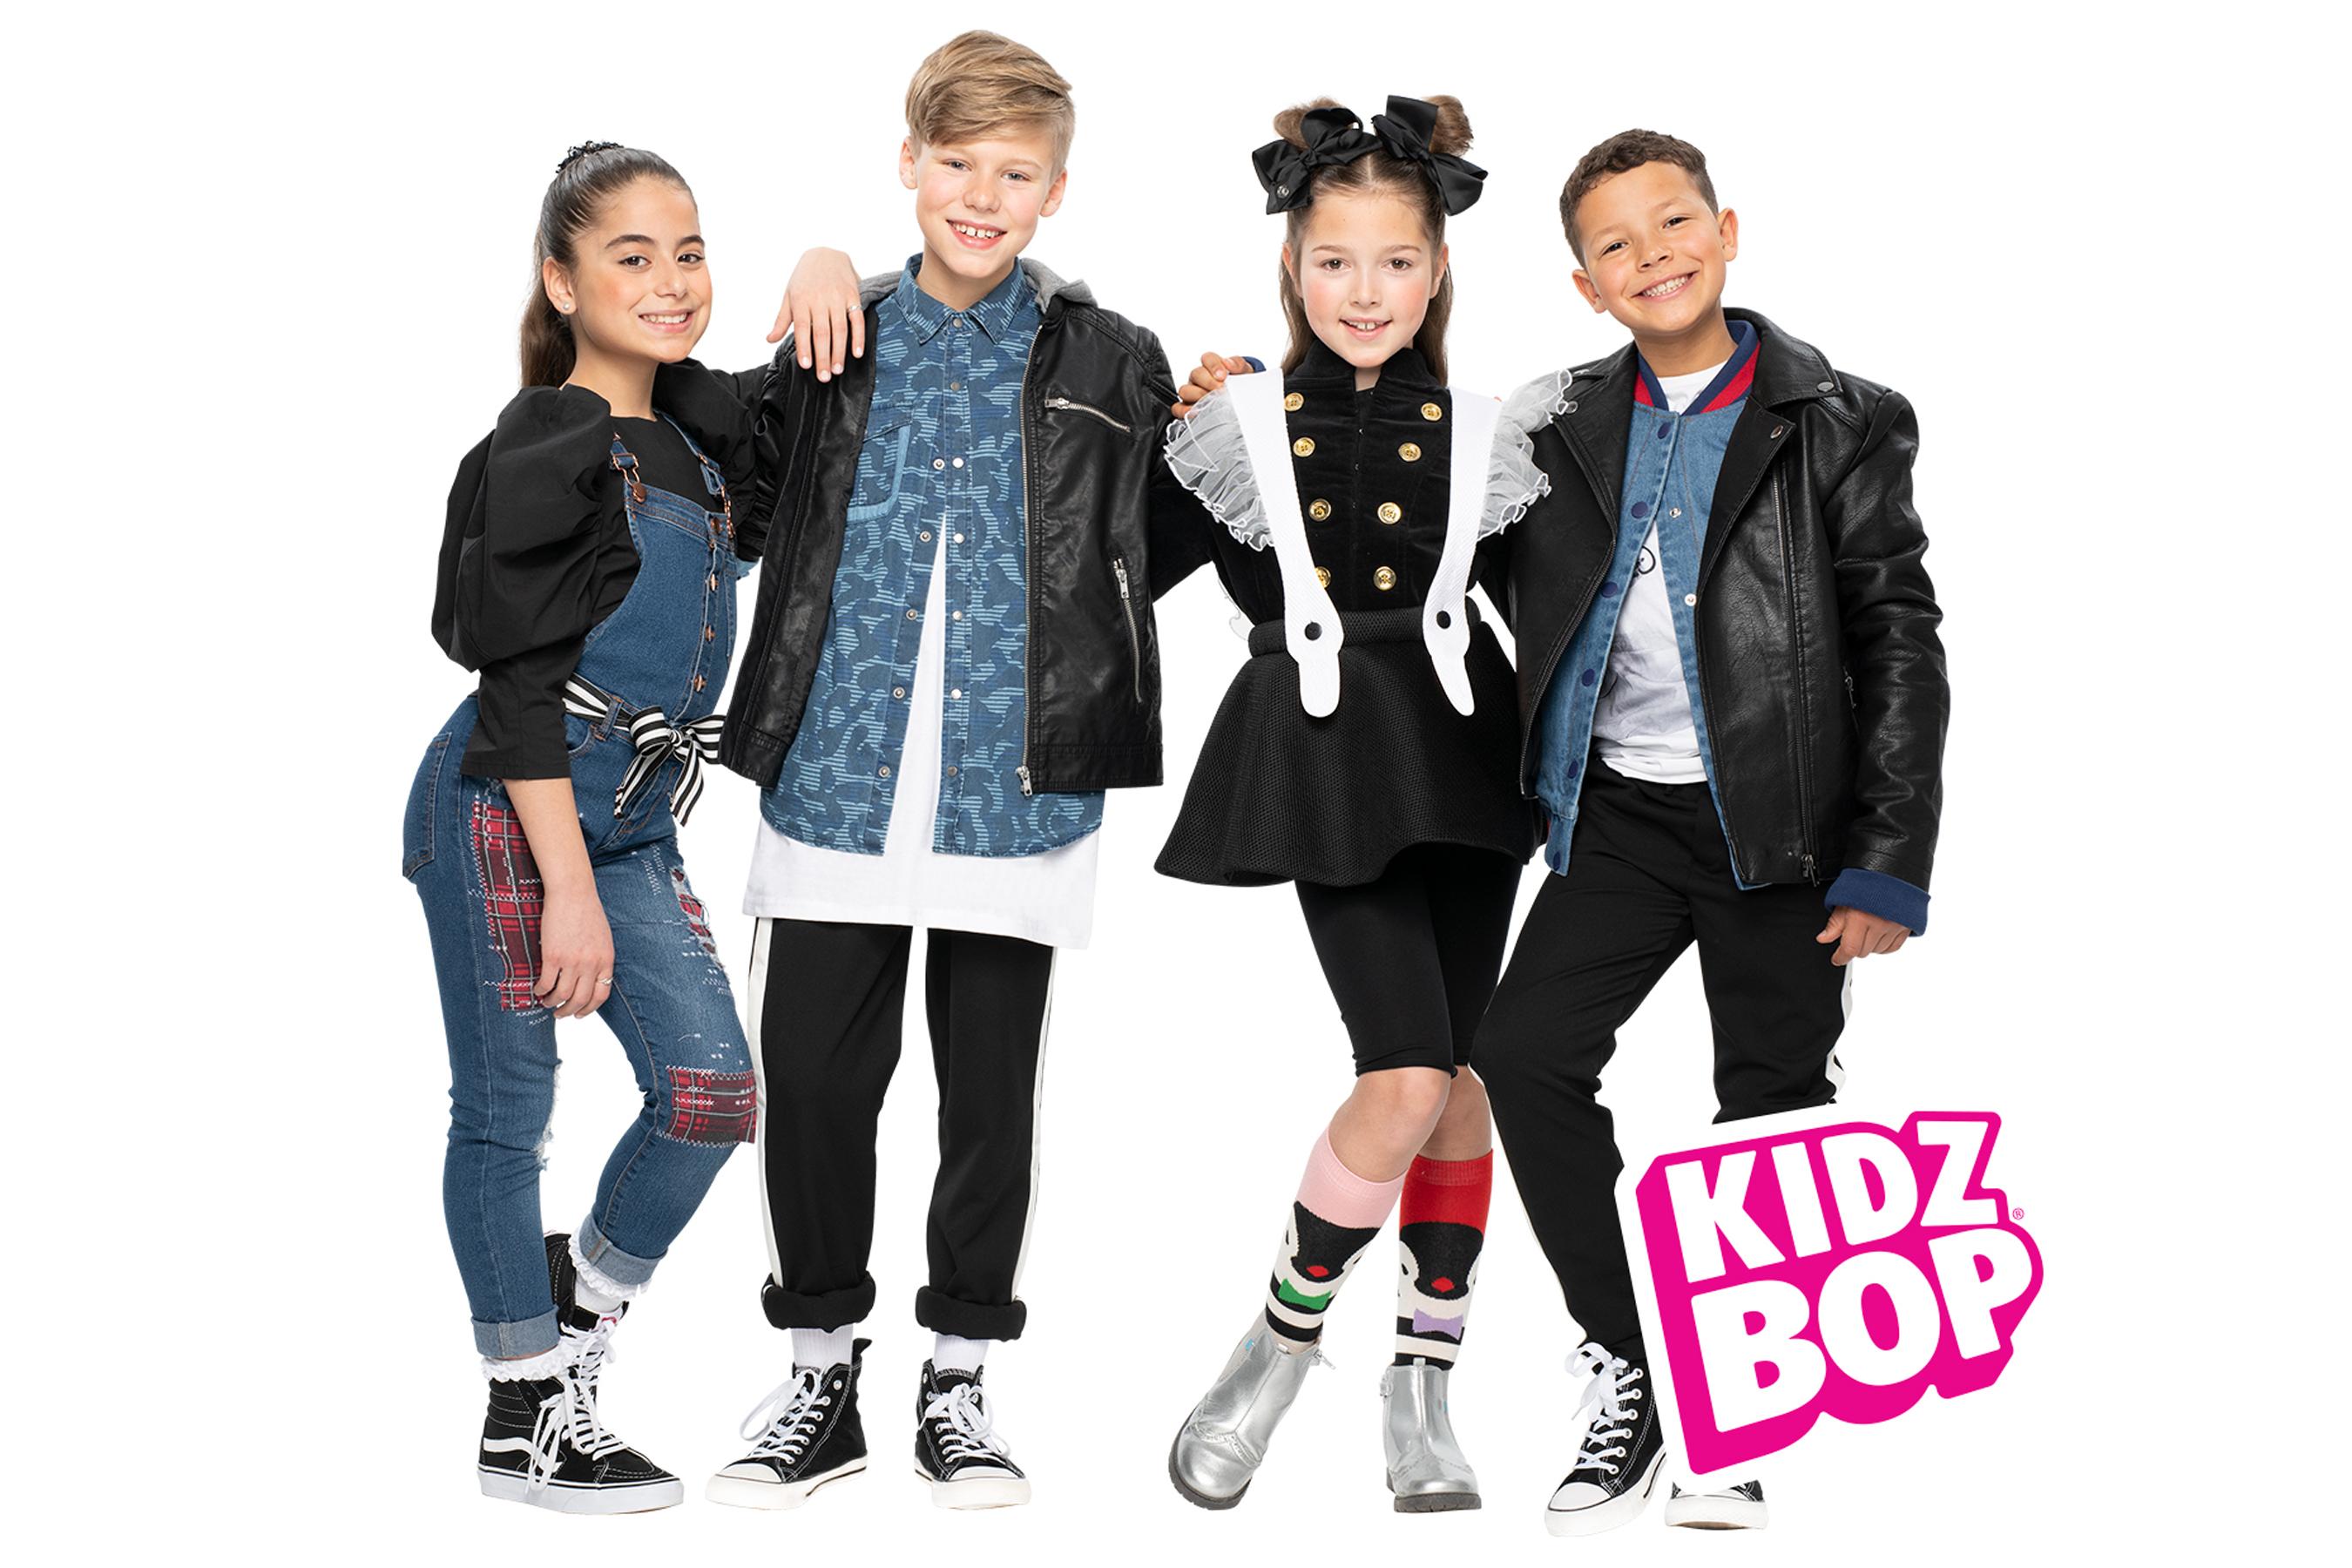 KIDZ BOP Kids | Start